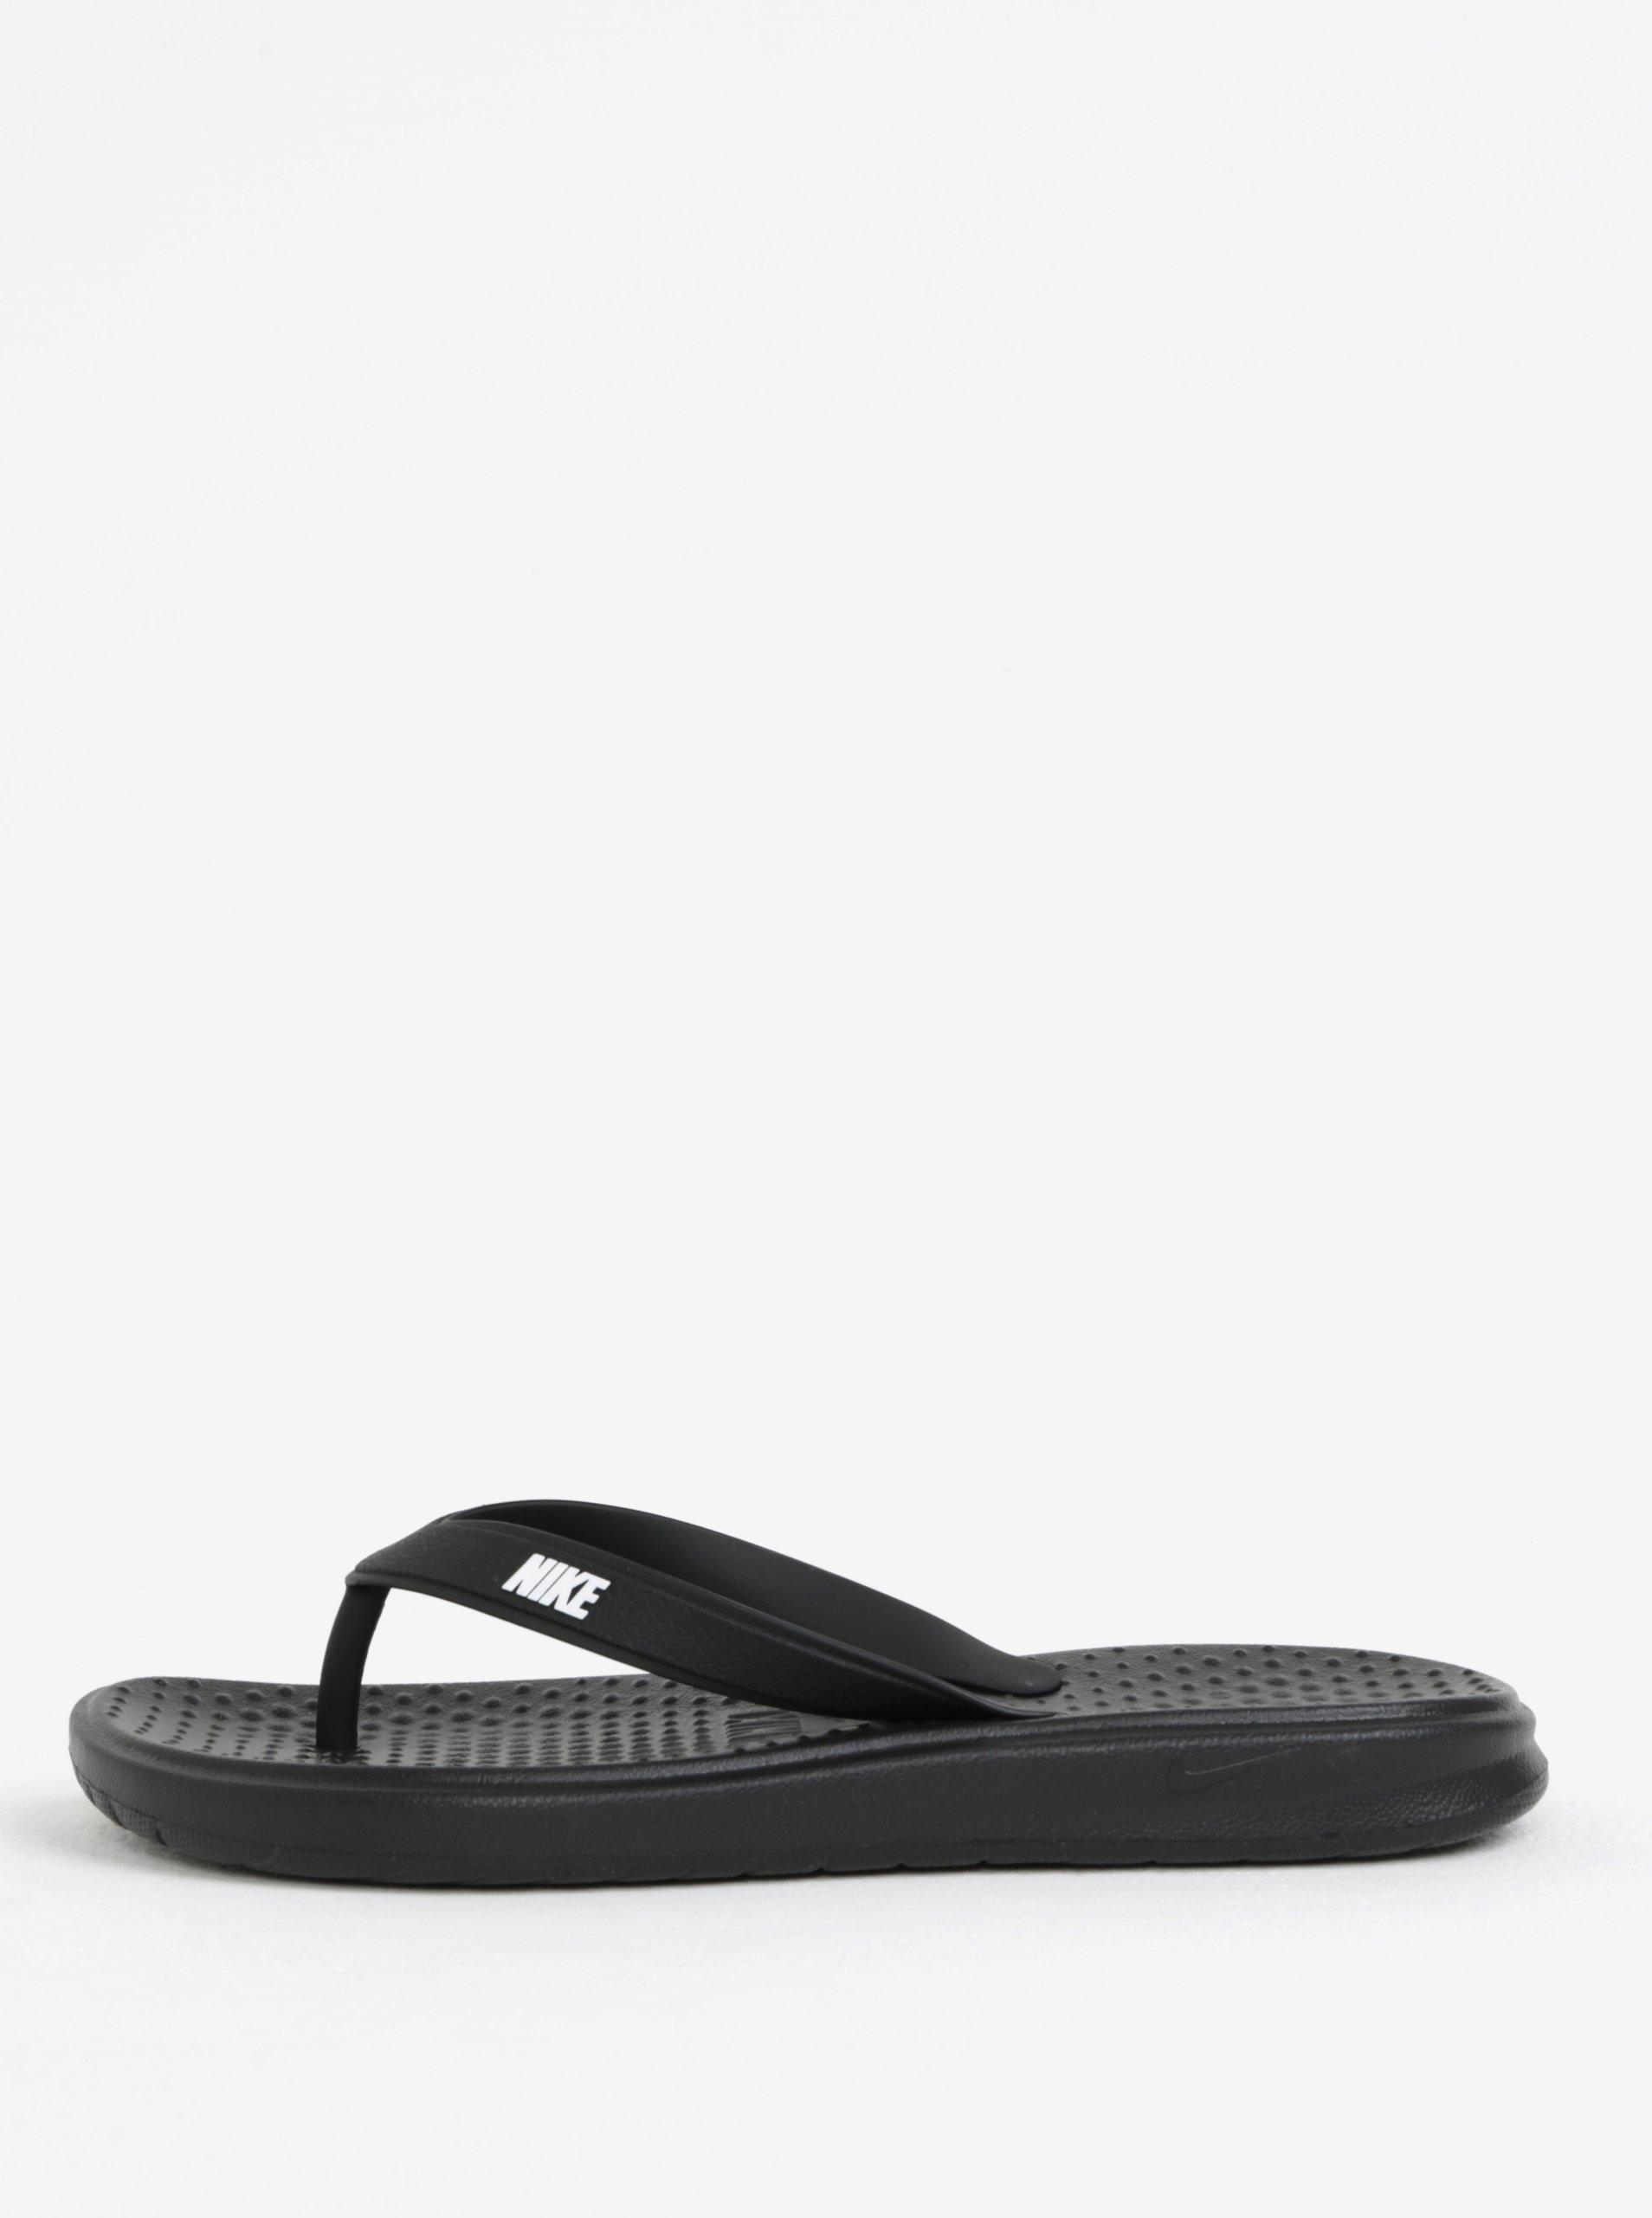 Černé pánské žabky Nike Solay Thong 8280e3574f